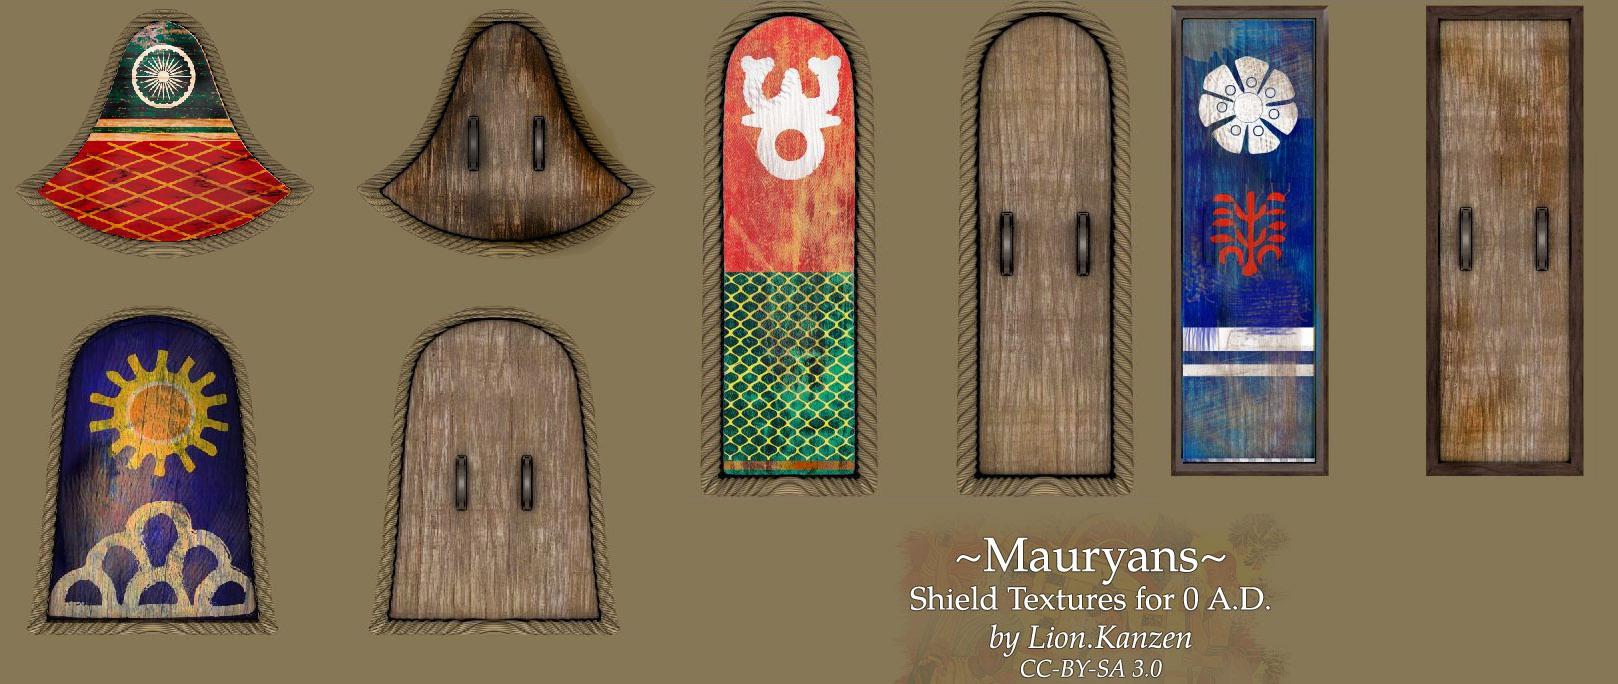 mauryan-shields-01.jpg